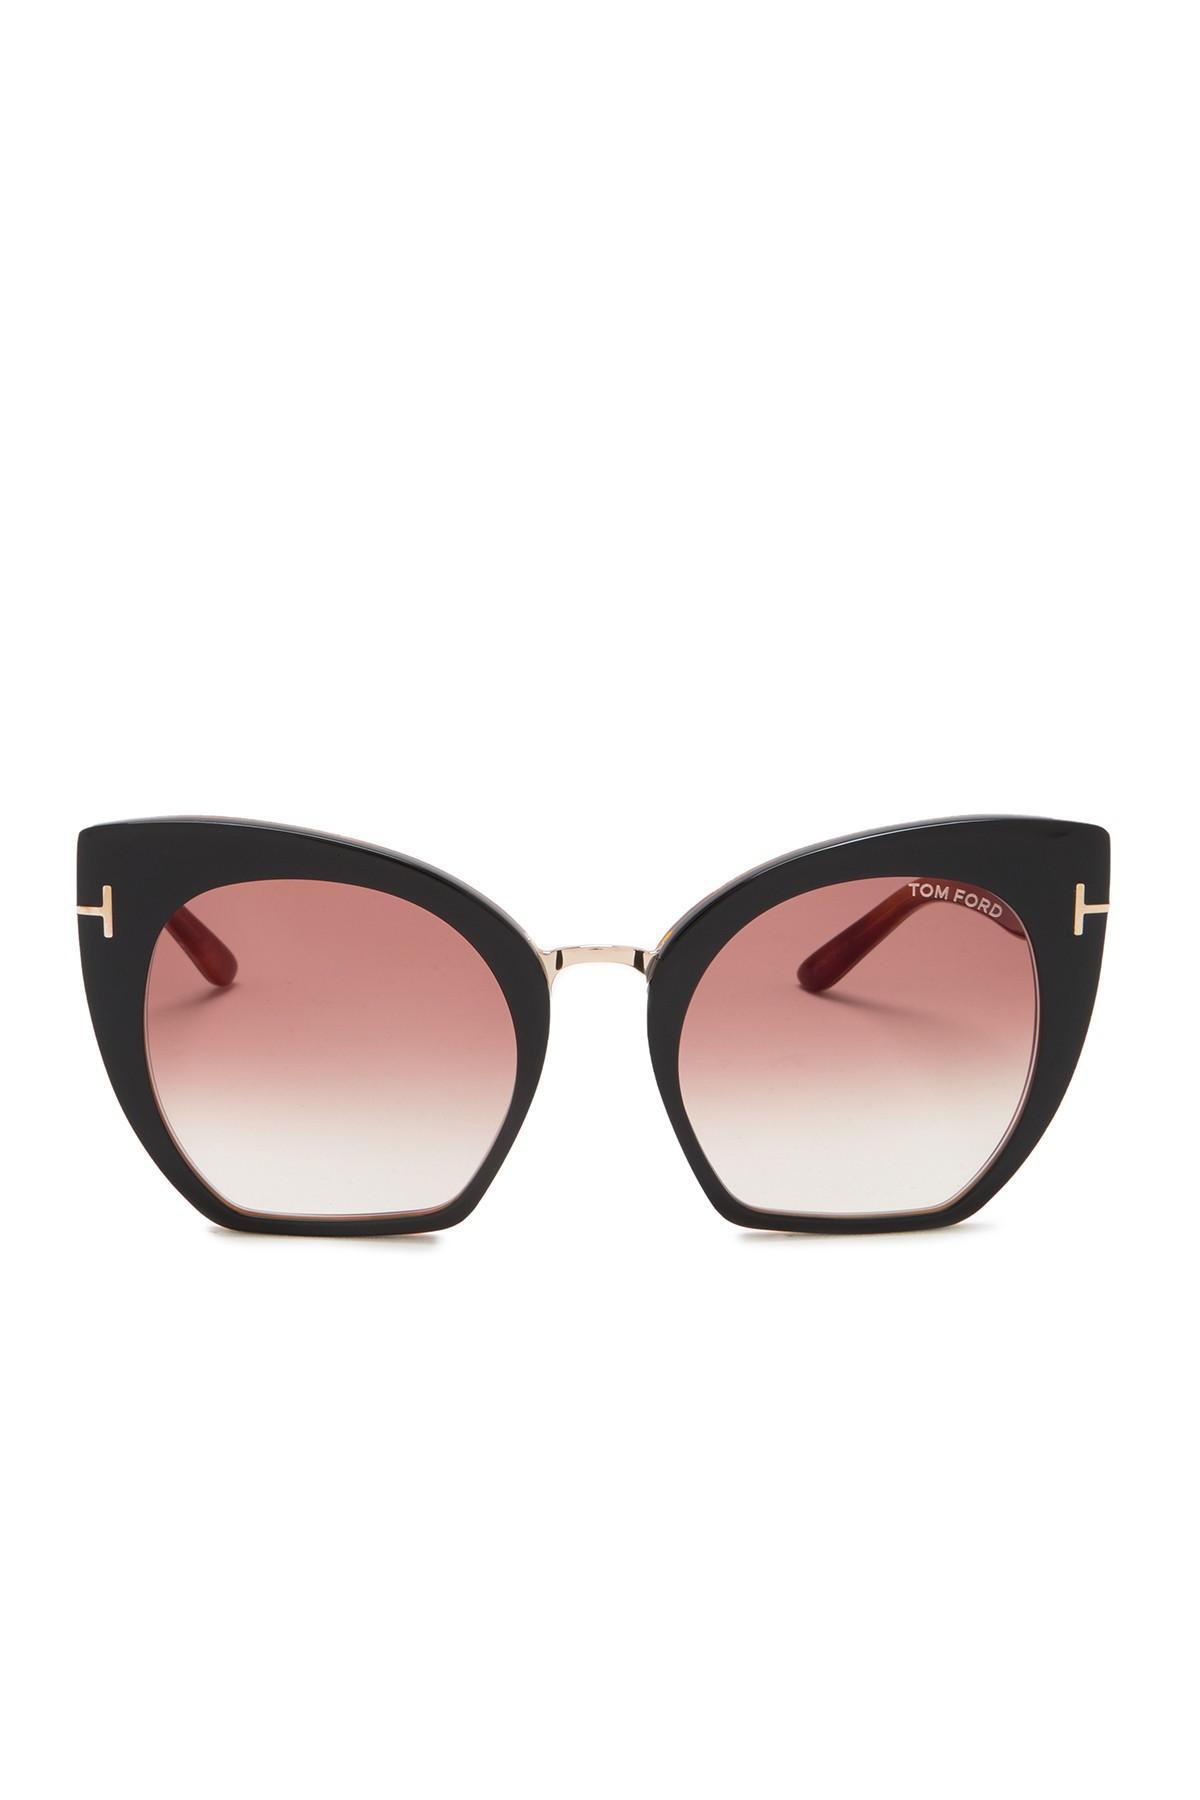 c49f0942b53 Tom Ford - Multicolor Samantha 55mm Modified Cat Eye Sunglasses - Lyst.  View fullscreen